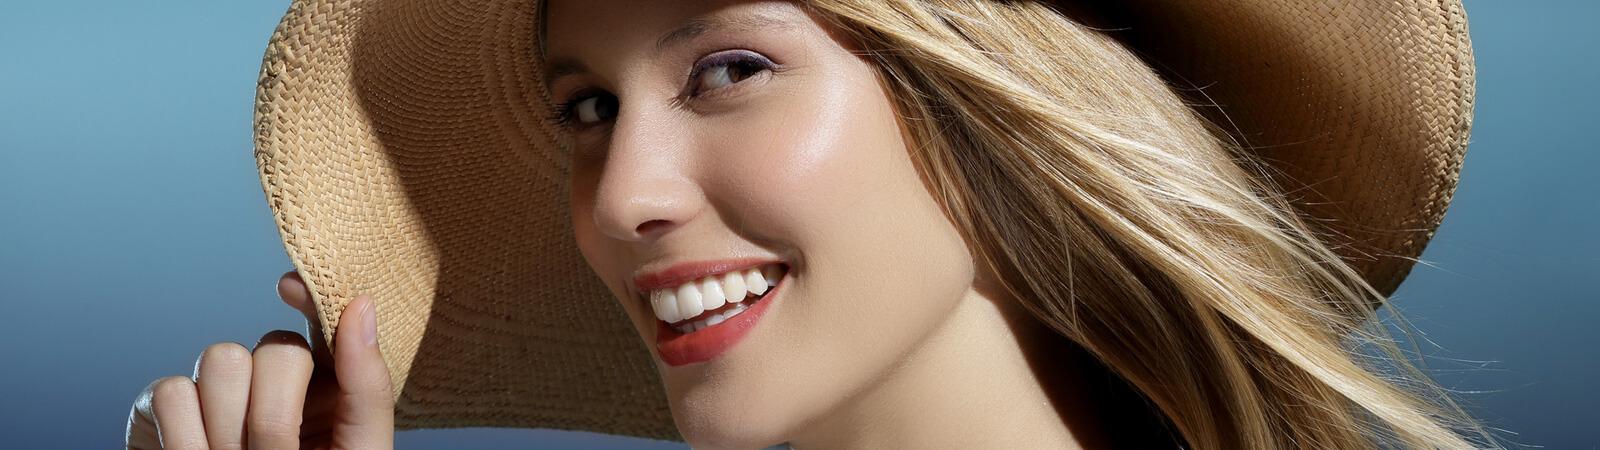 Smile Gallery - Vivid Dental, Houston TX